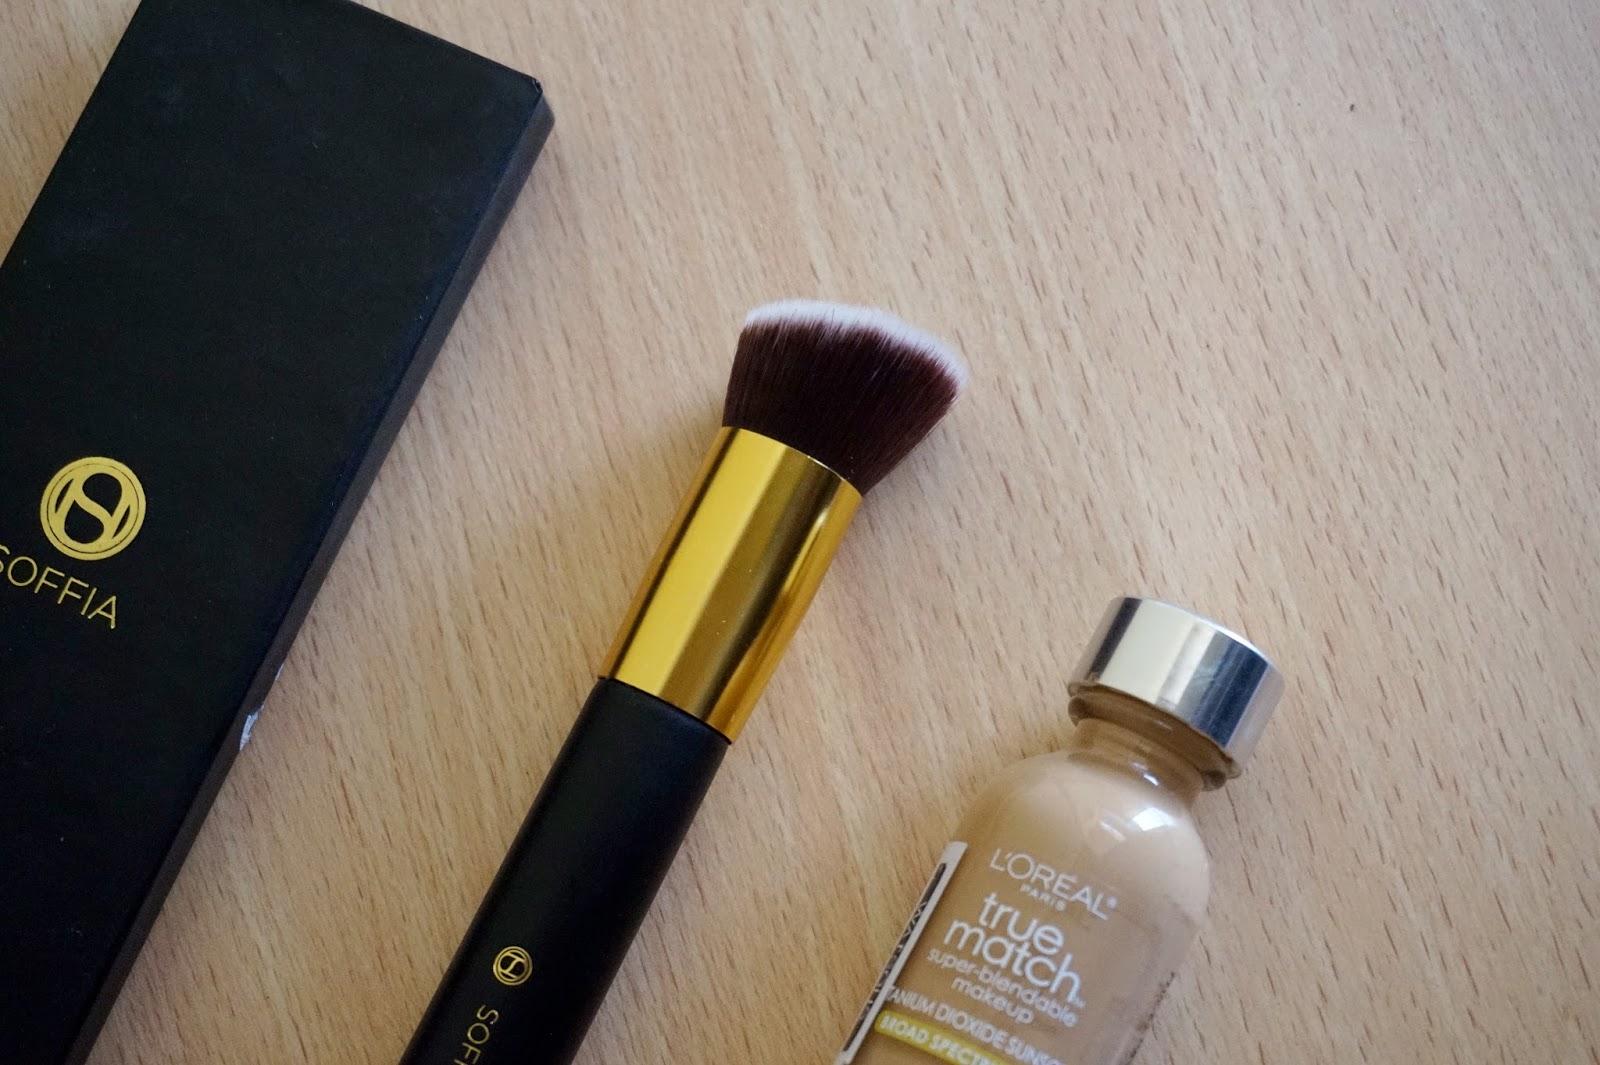 soffia opulence brush